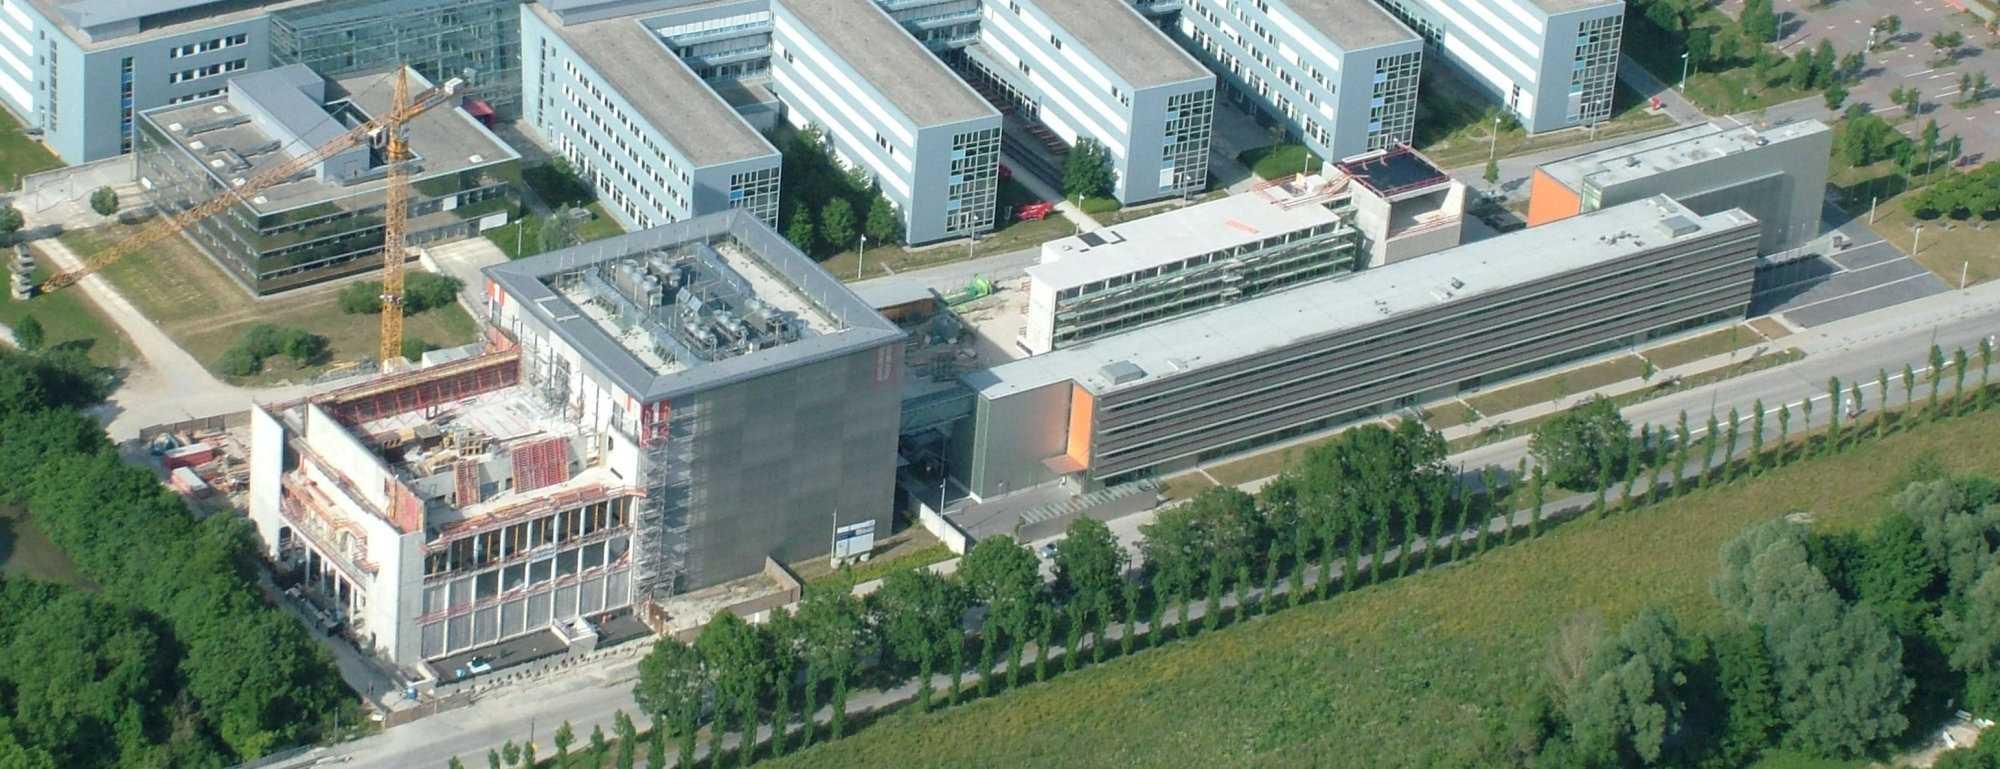 Luftbild LRZ-Ausbau